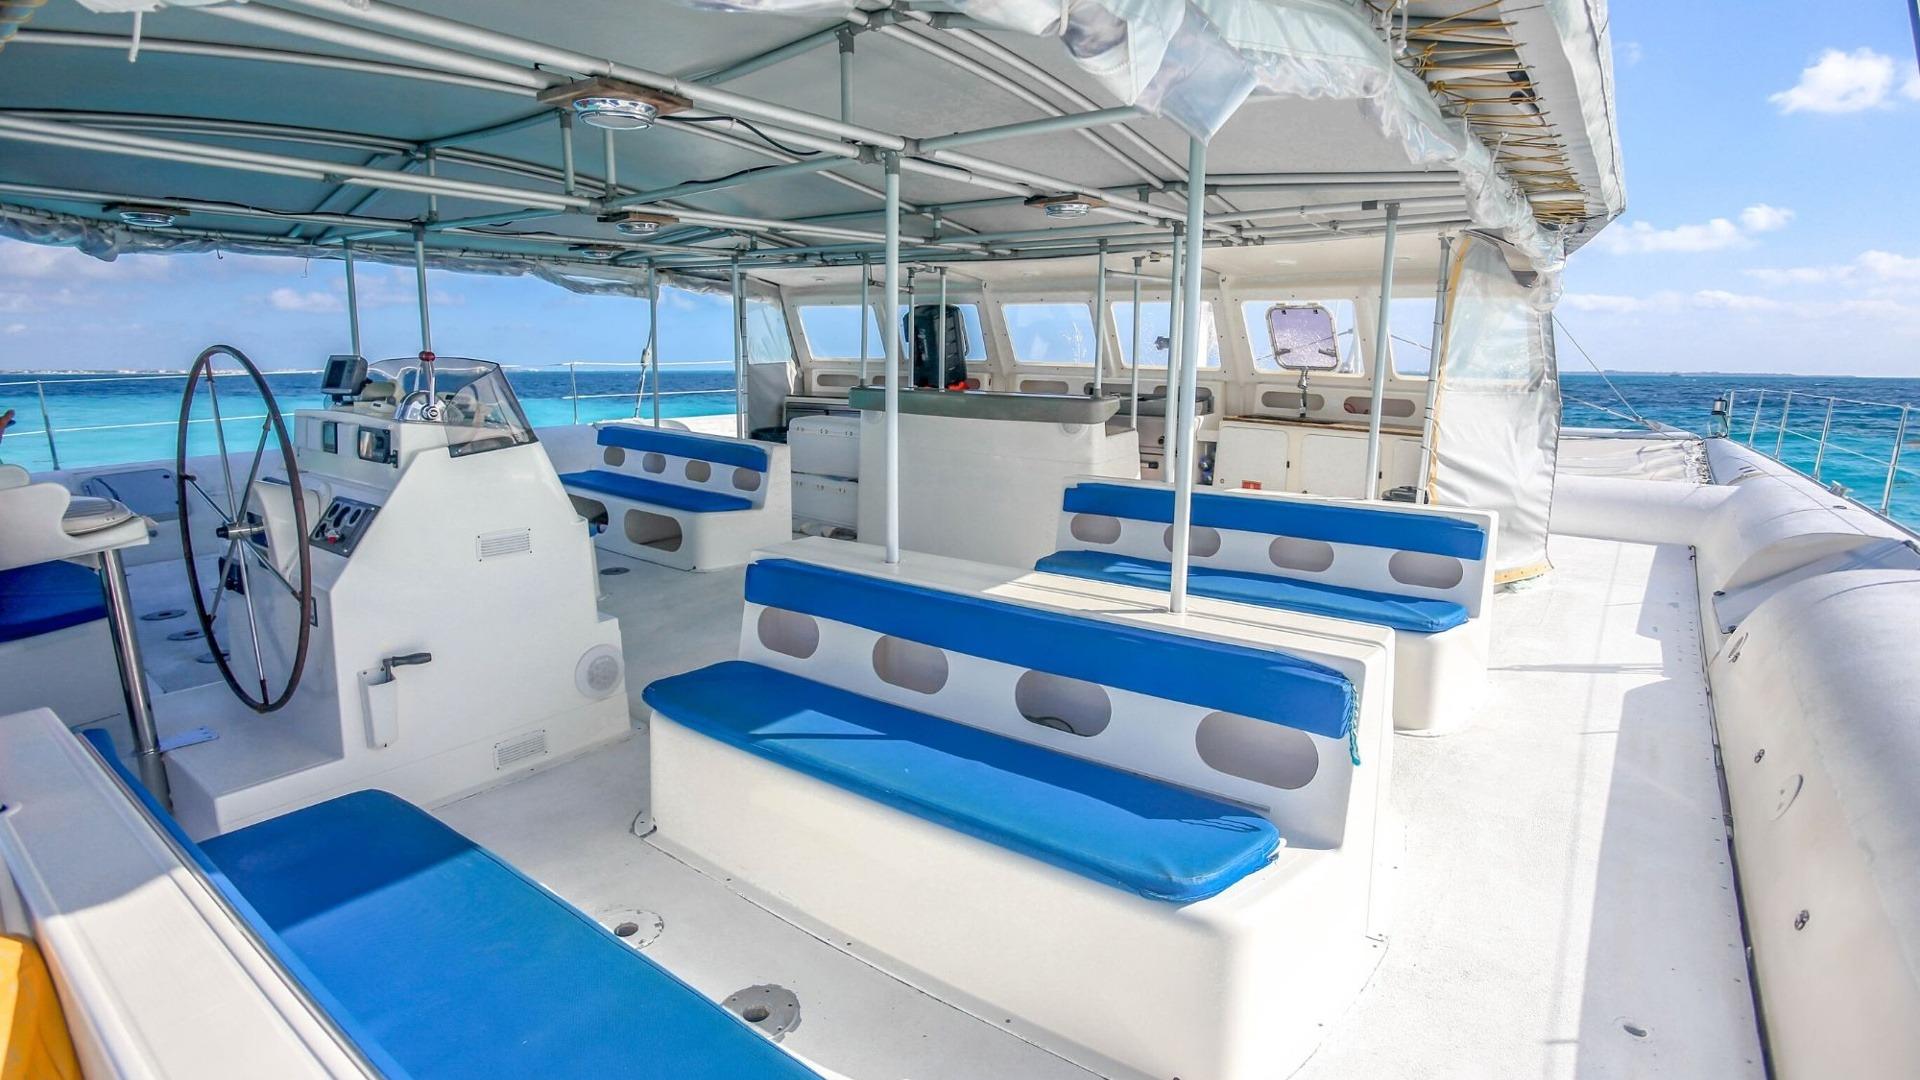 Sea Passion III - Isla Mujeres Catamaran Tour - Cancun Sailing